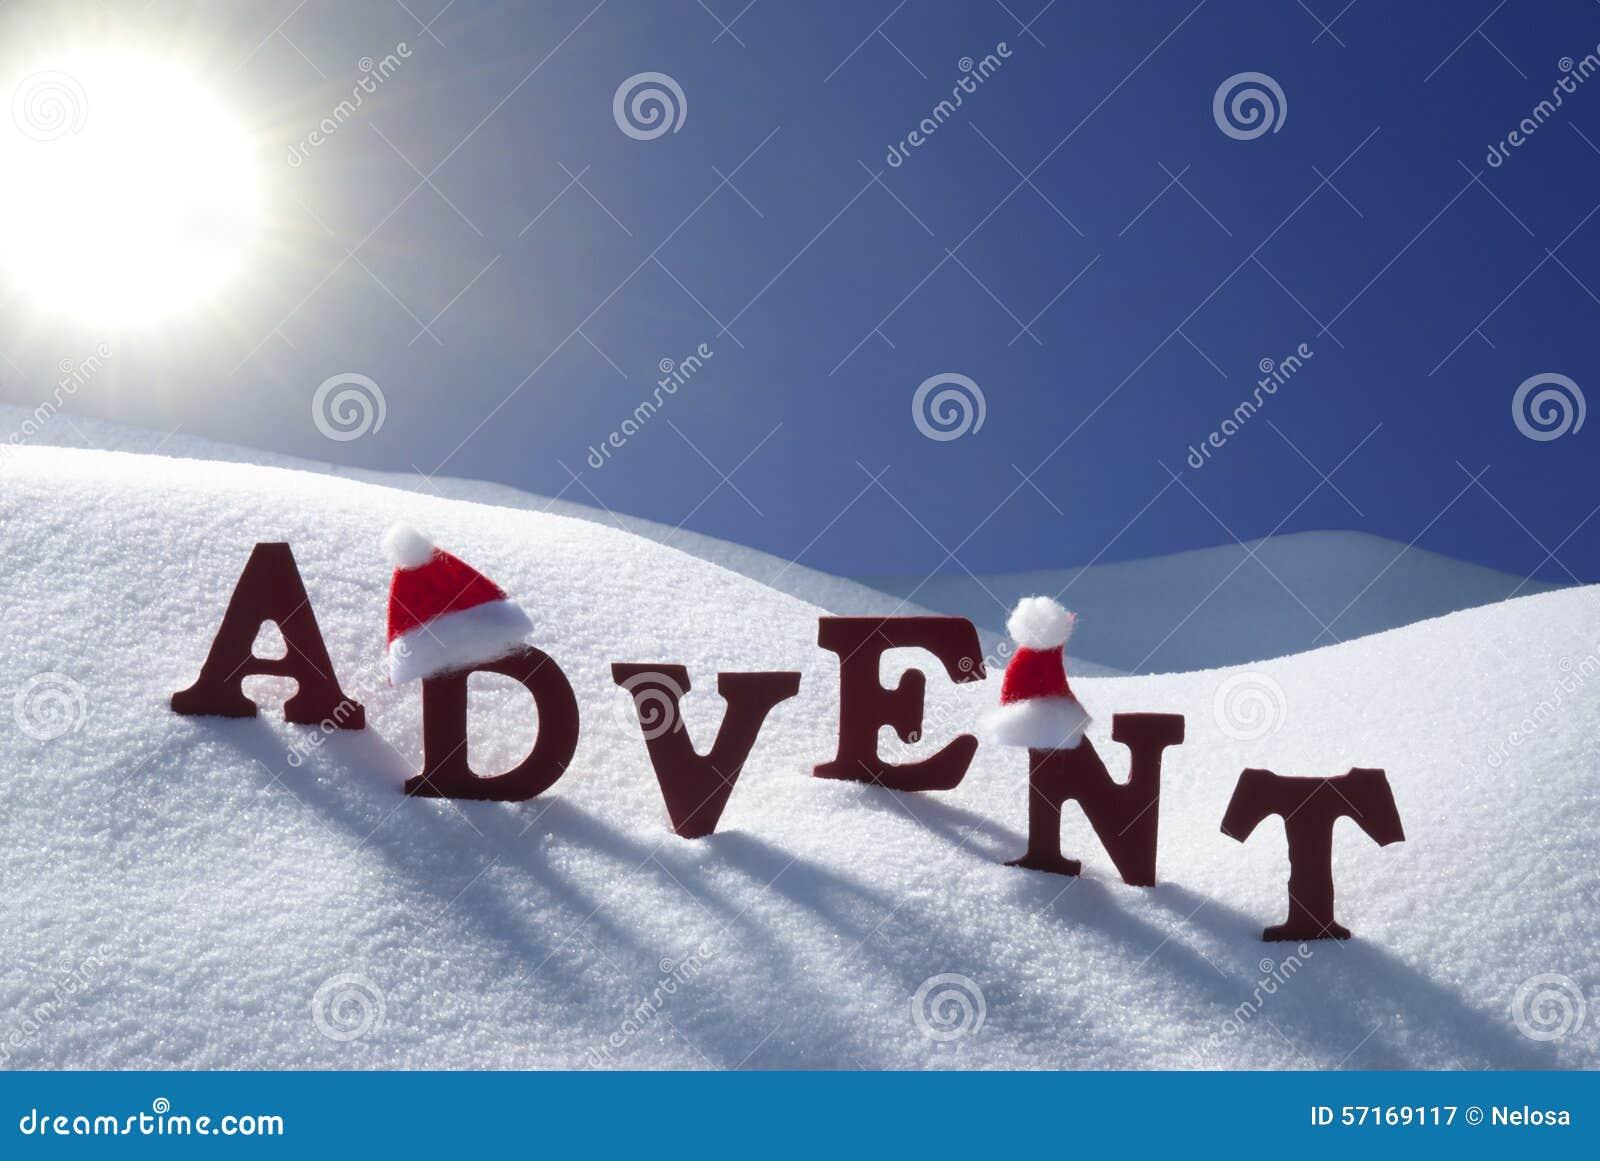 advent mean christmas time snow santa hat blue sky stock photo